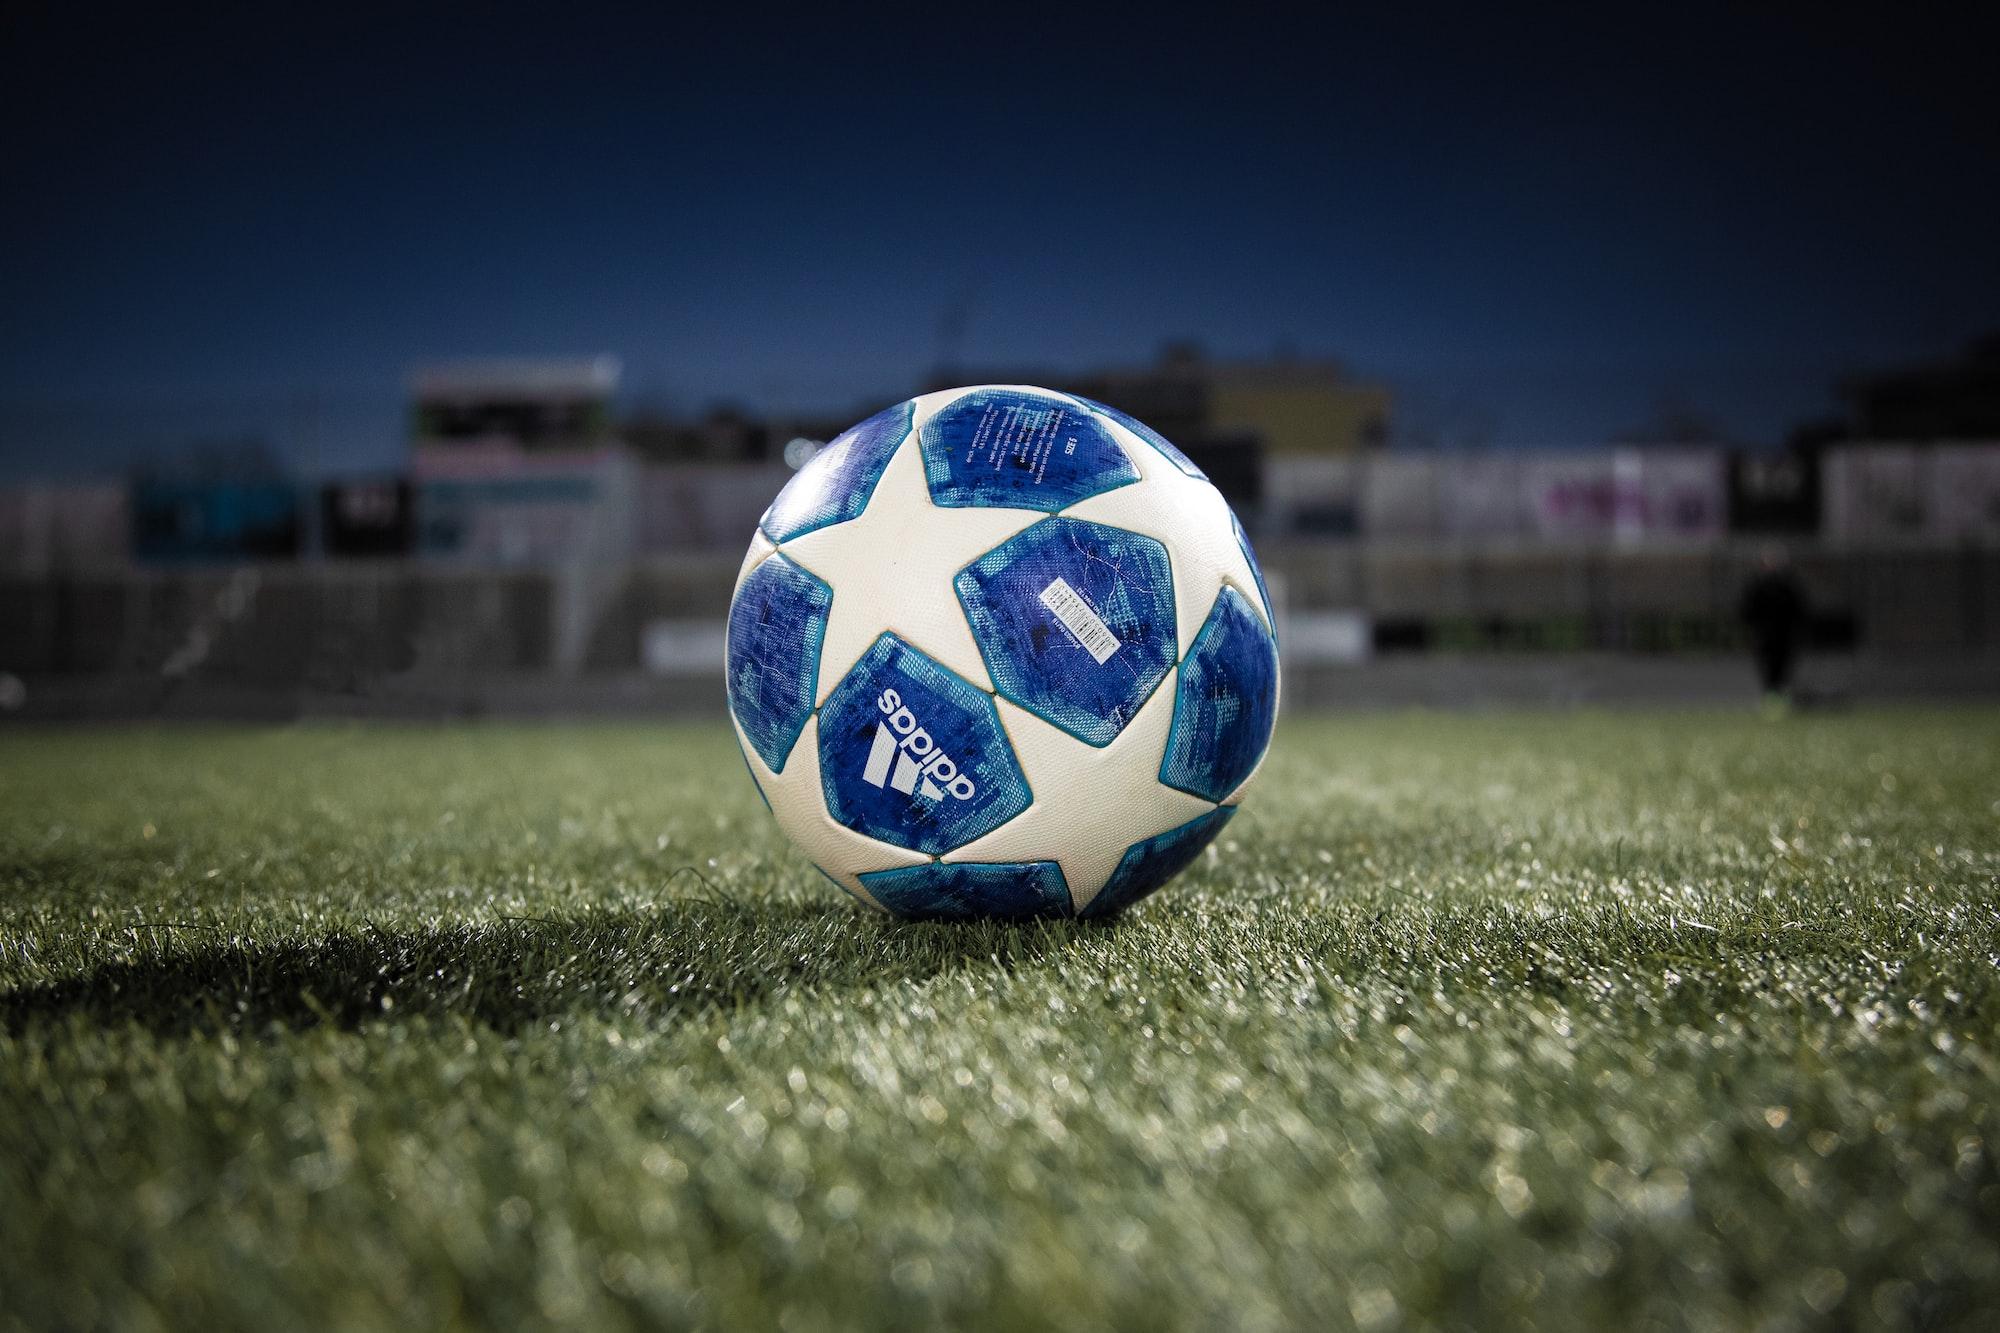 Pronostici qualificazioni Champions League 2021-22